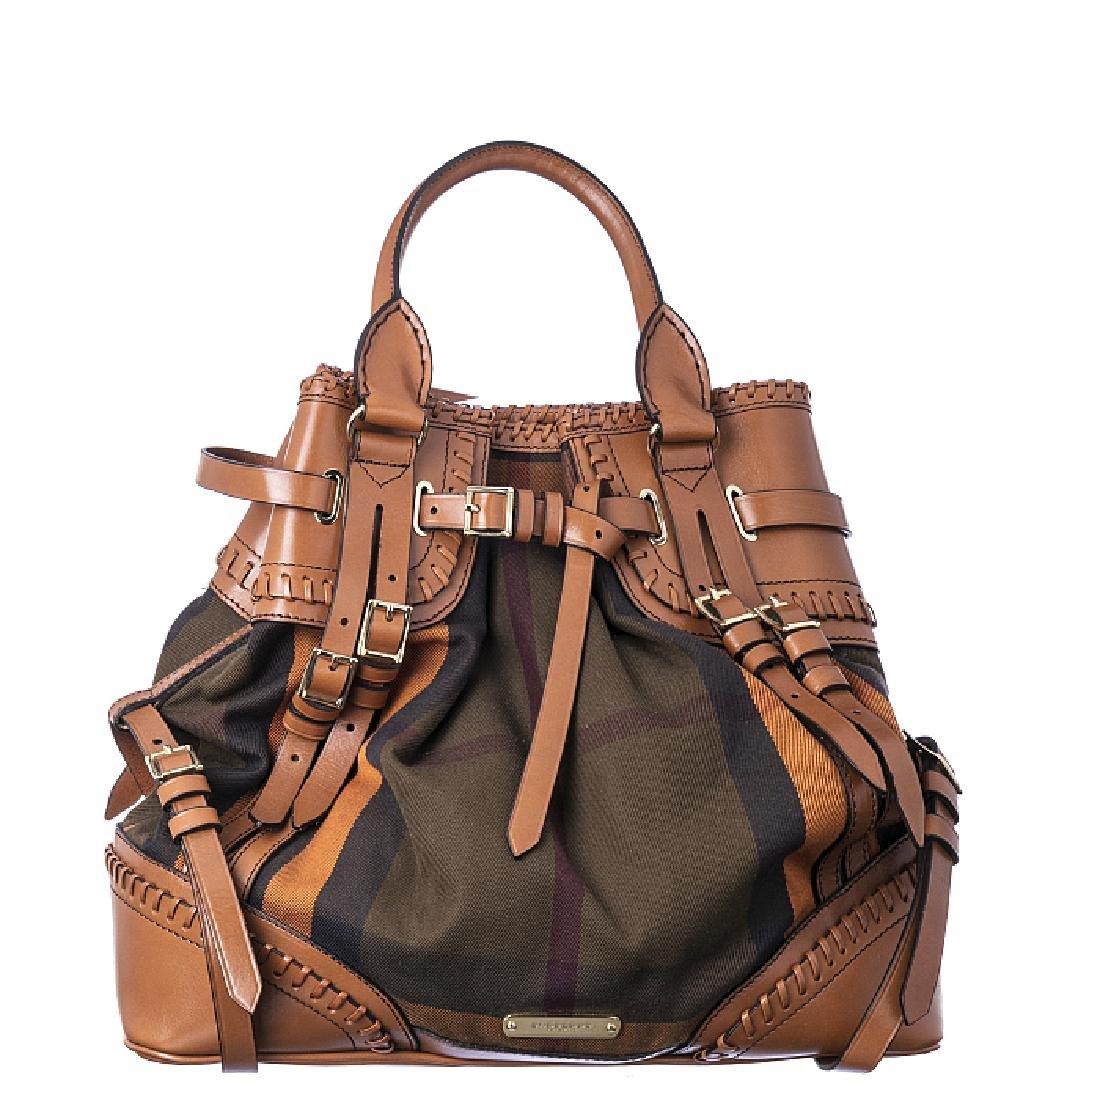 BURBERRY - Fashion bag